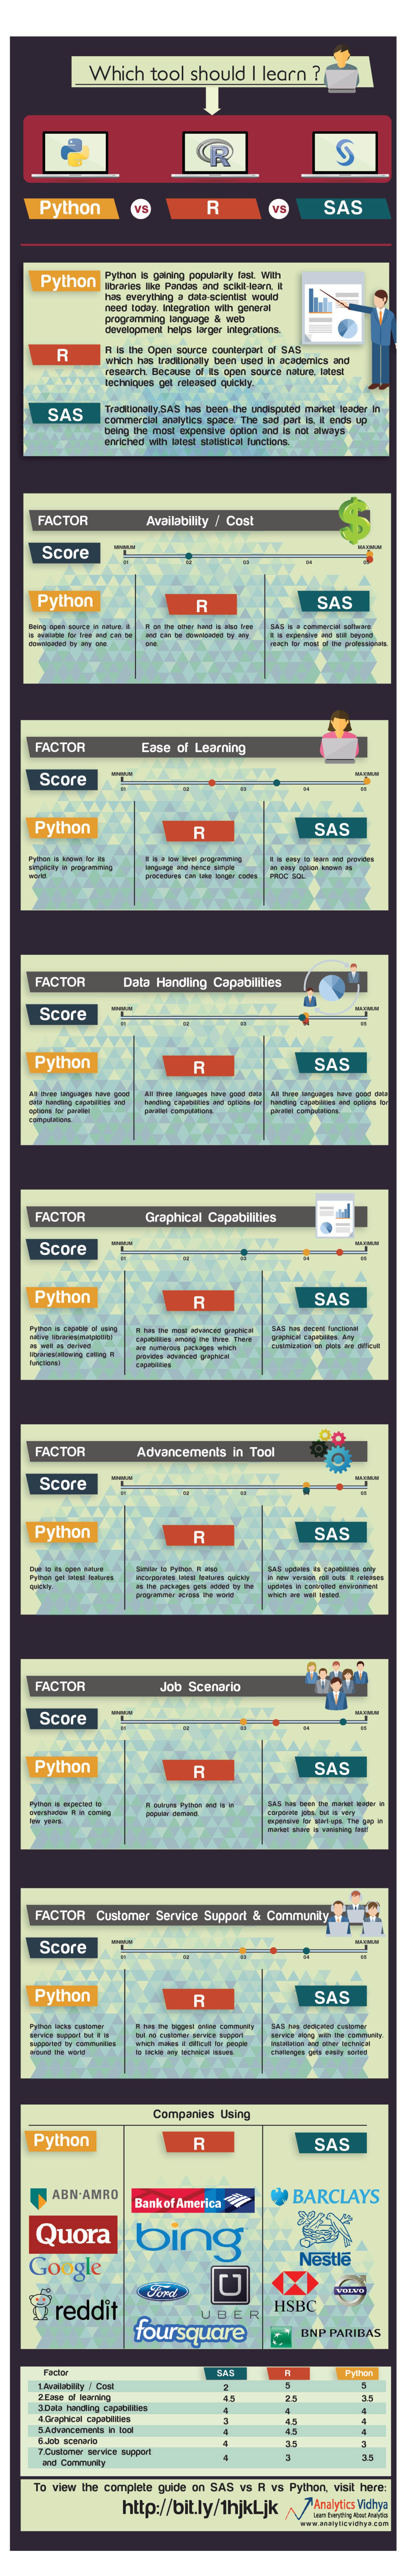 SAS vs R vs Python infographic datascience